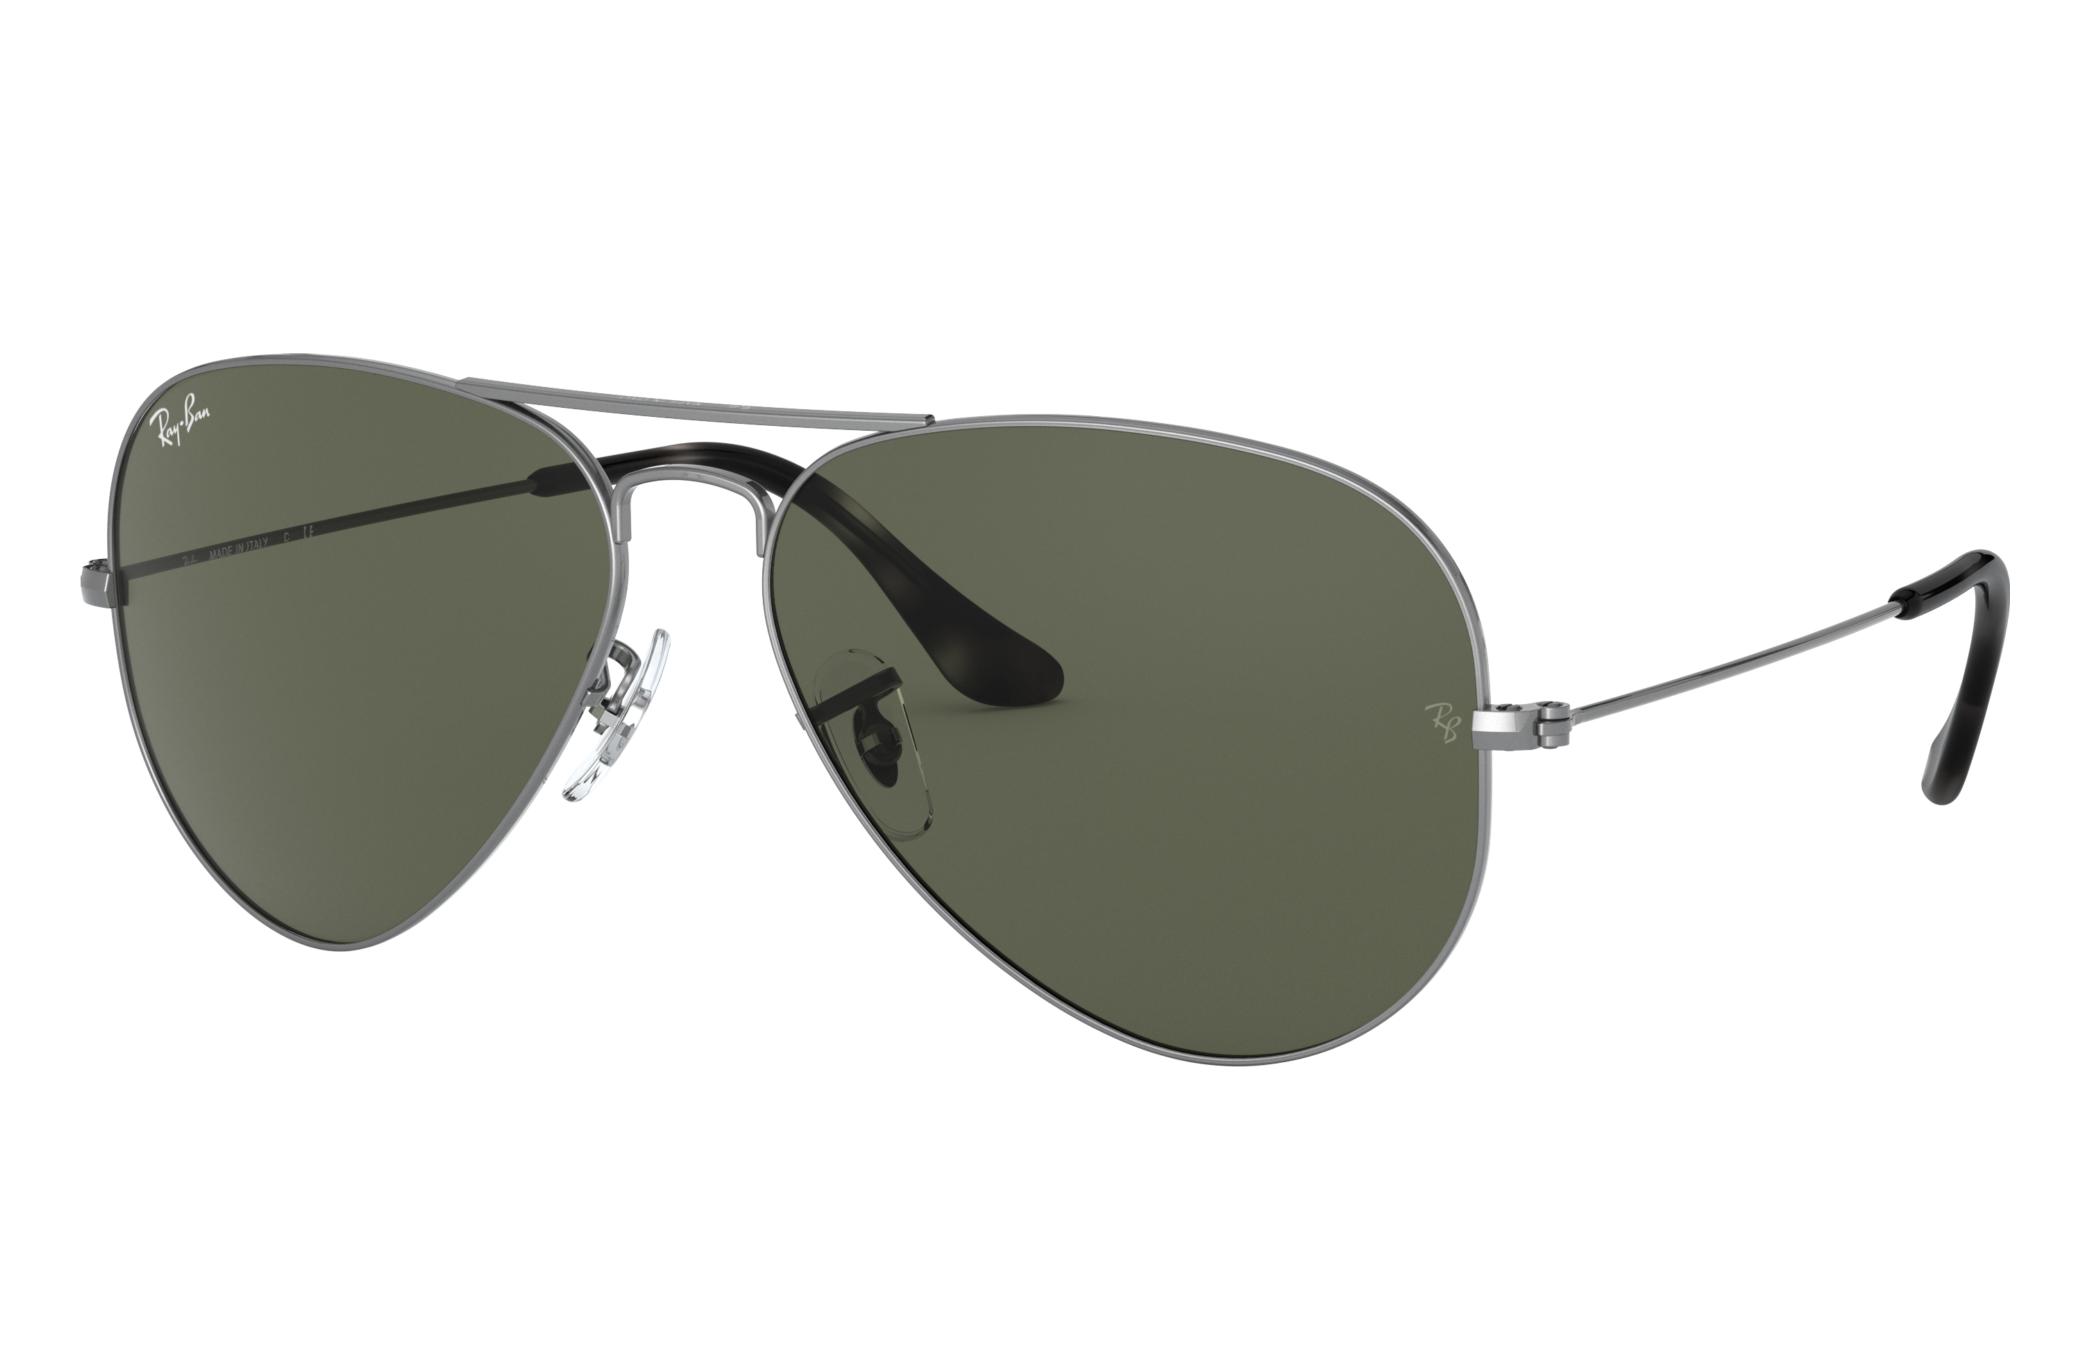 Ray-Ban Aviator Classic Grey Metal, Green Lenses - RB3025